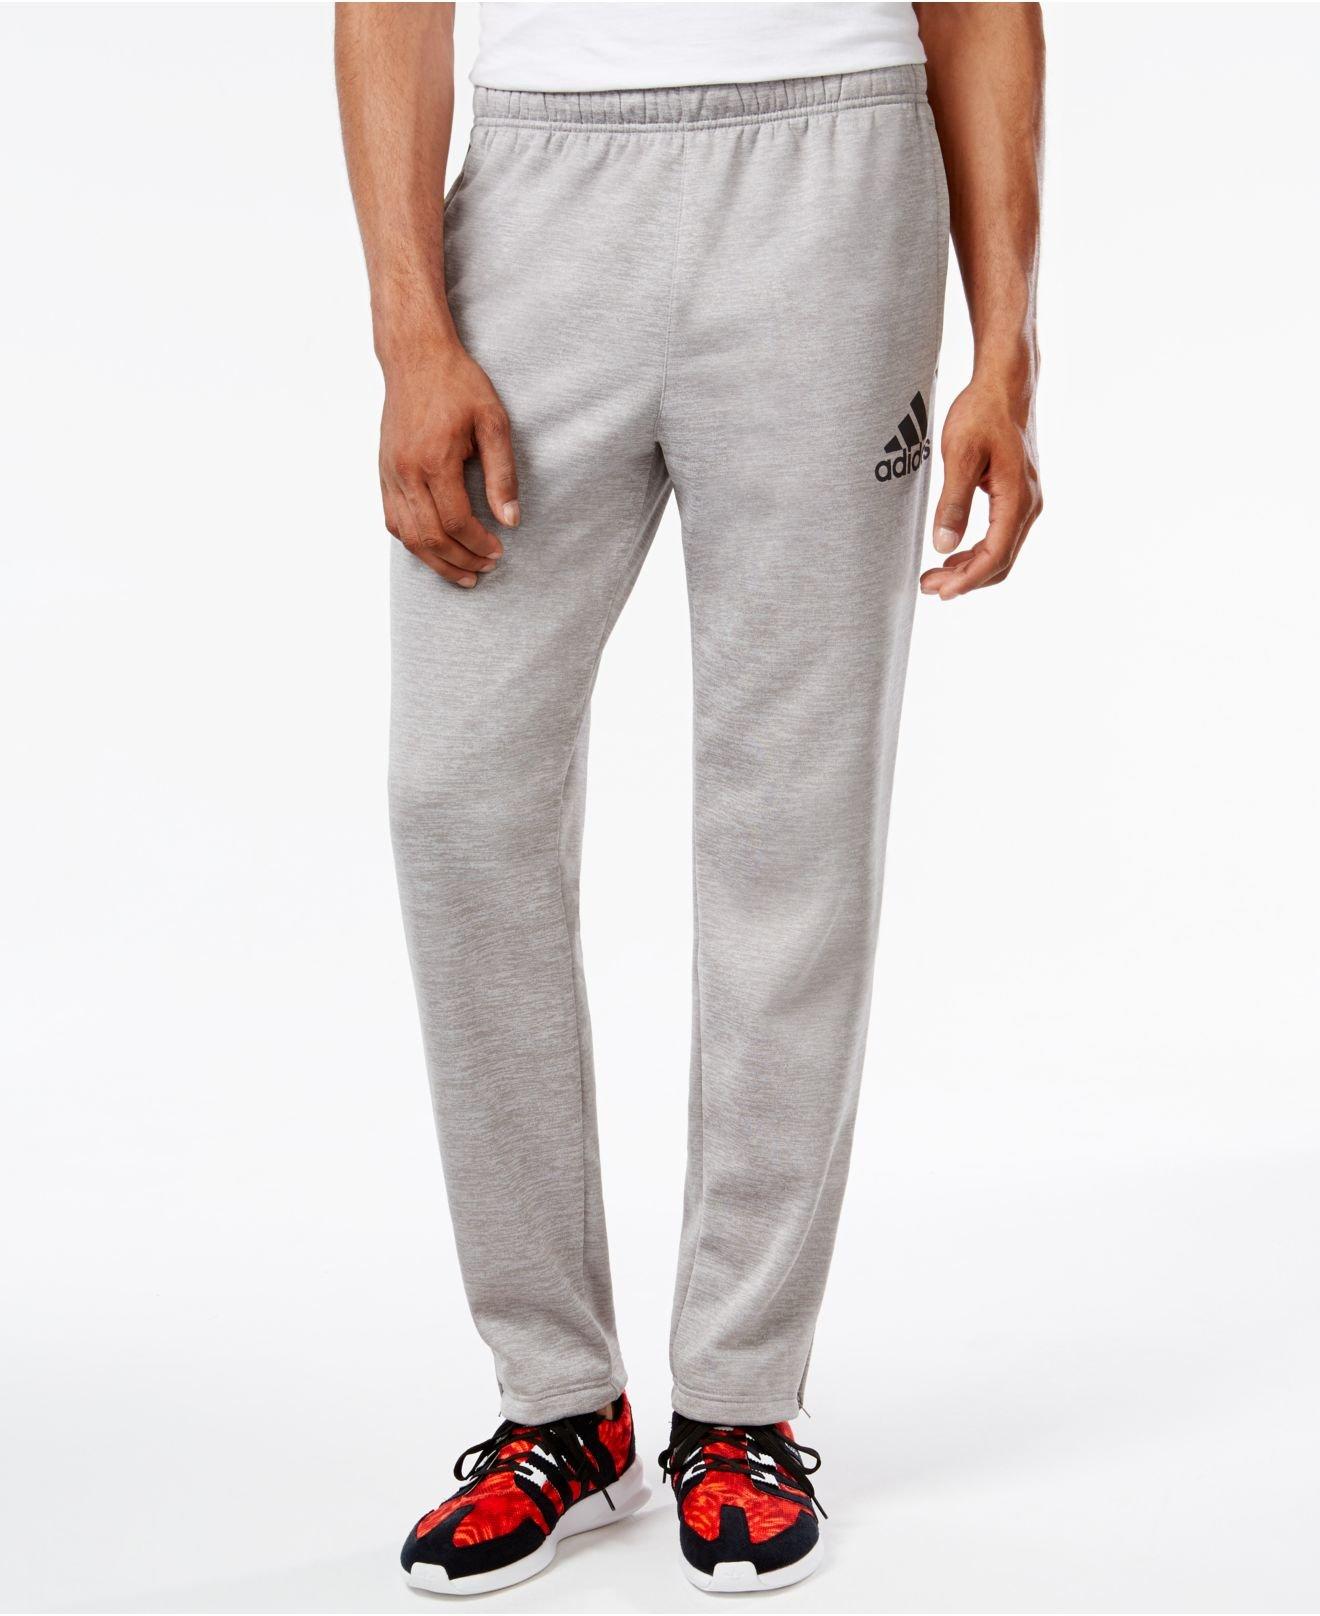 d76b55b73ca Lyst - adidas Men s Climawarm Tech Fleece Sweatpants in Gray for Men